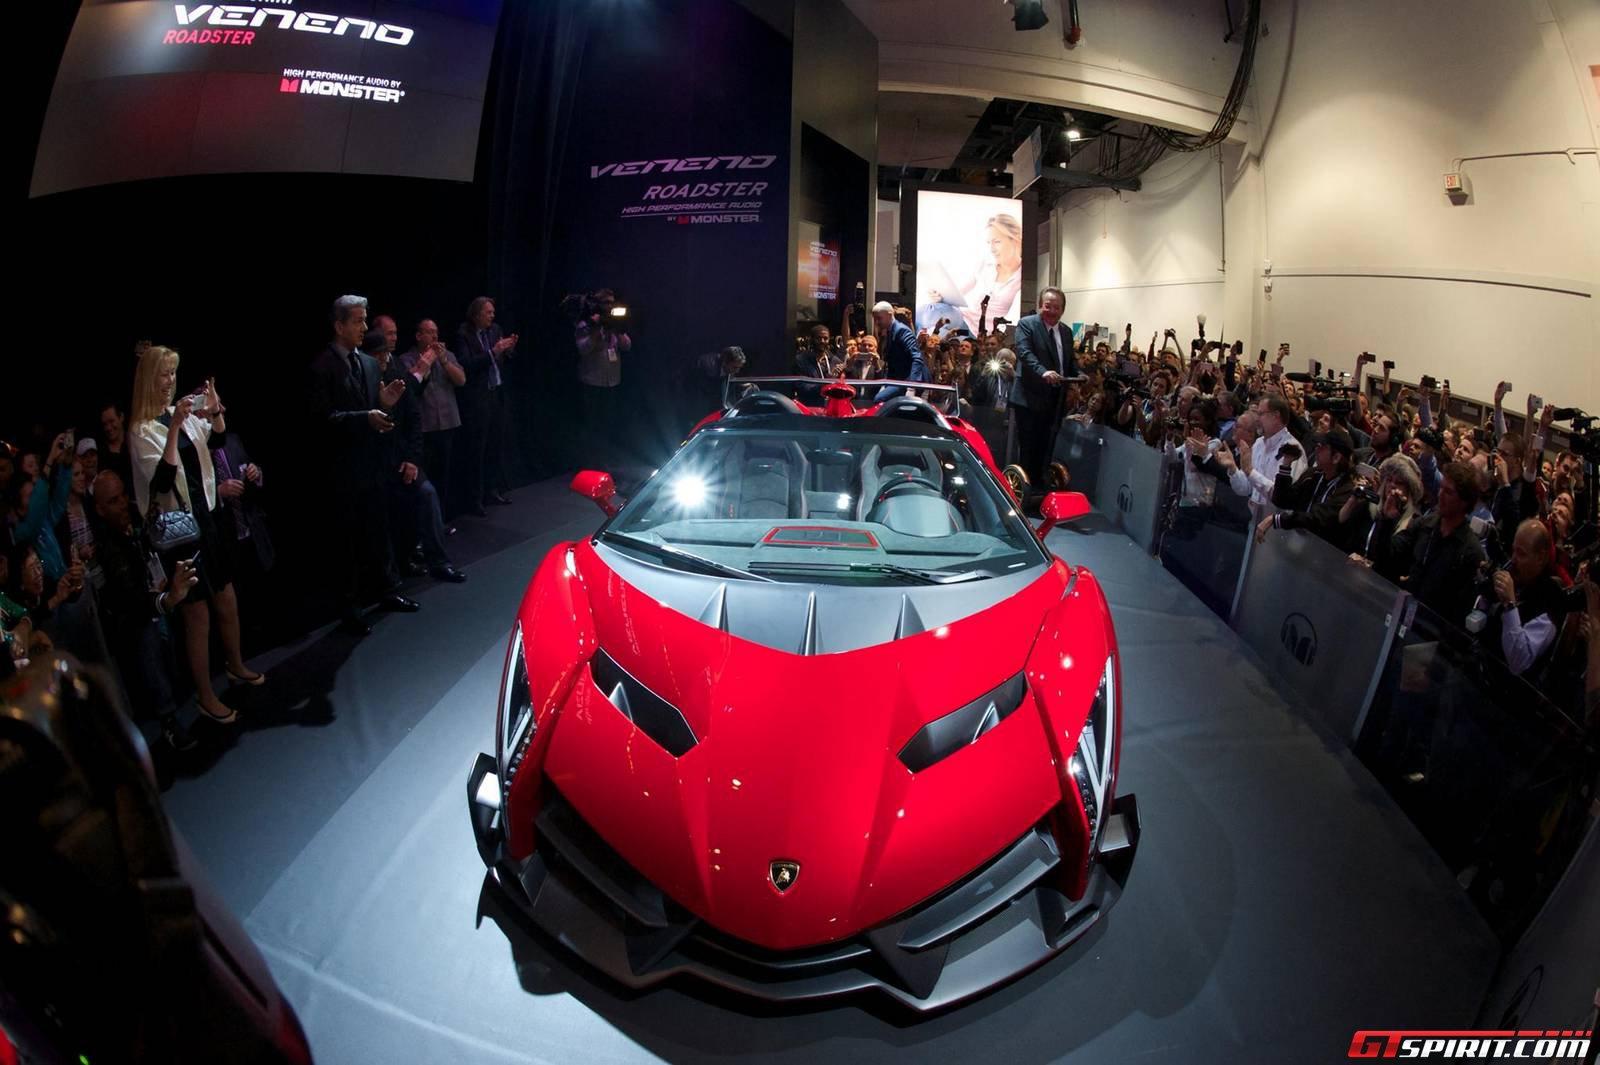 Ces Lamborghini Veneno Roadster With Monster Audio System